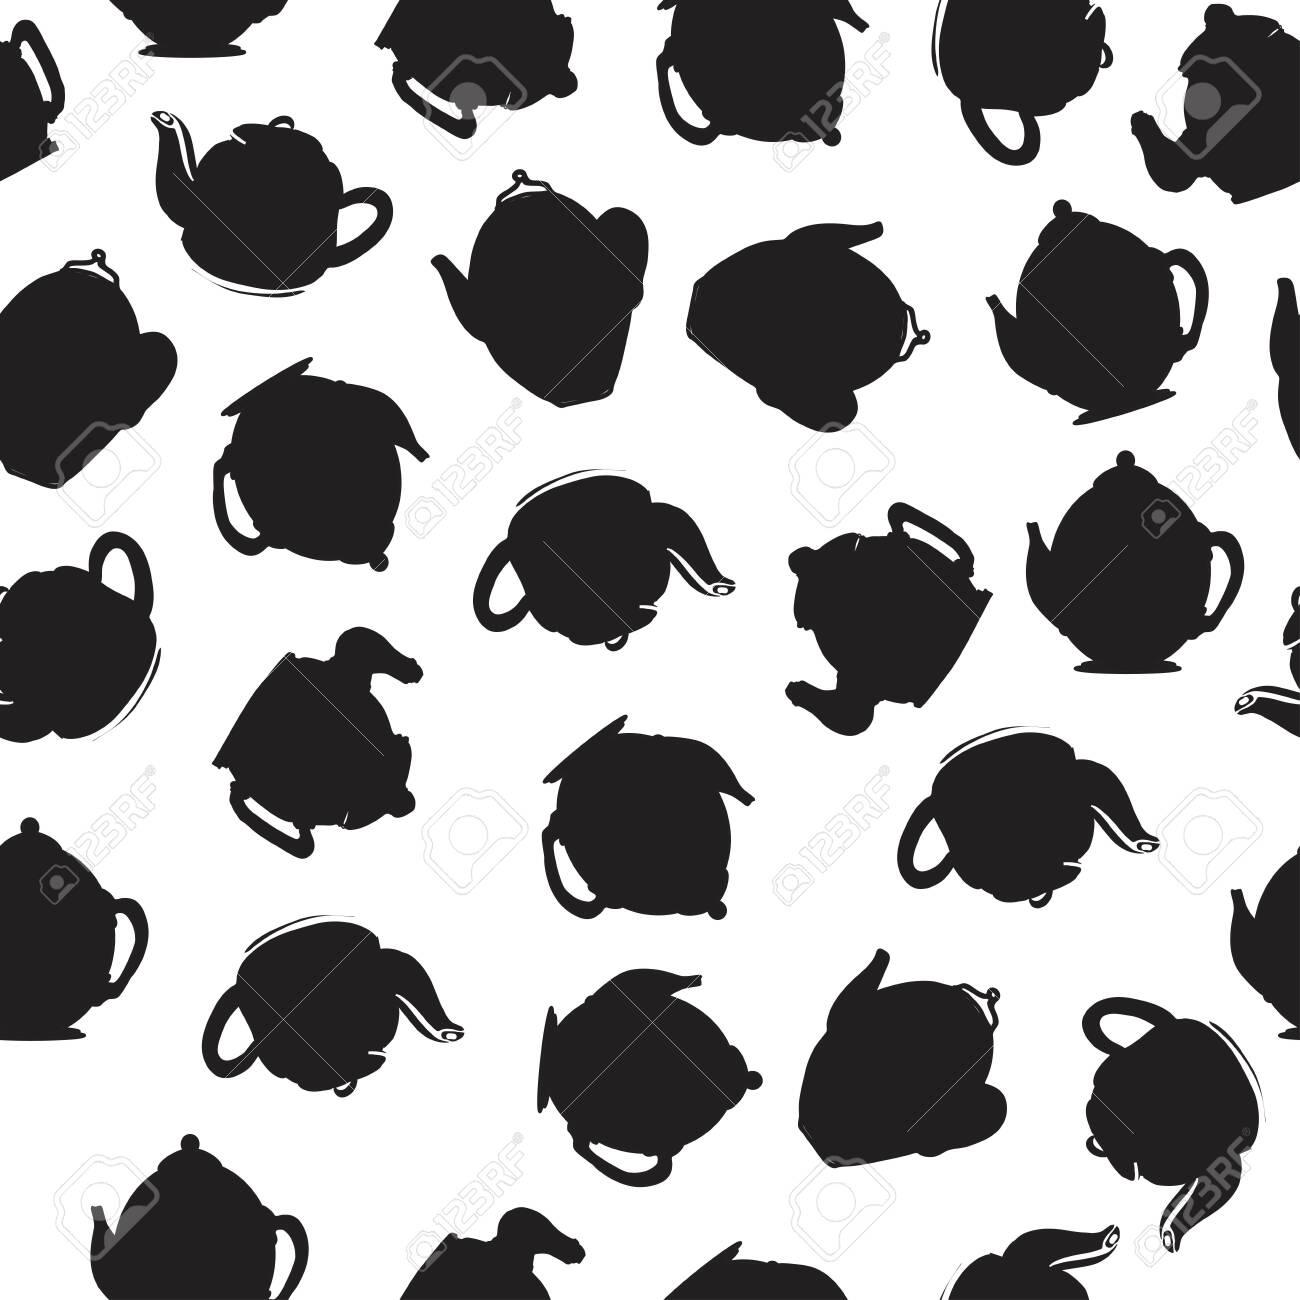 Tea pot seamless pattern for your design: posters, website, menu - 118664695